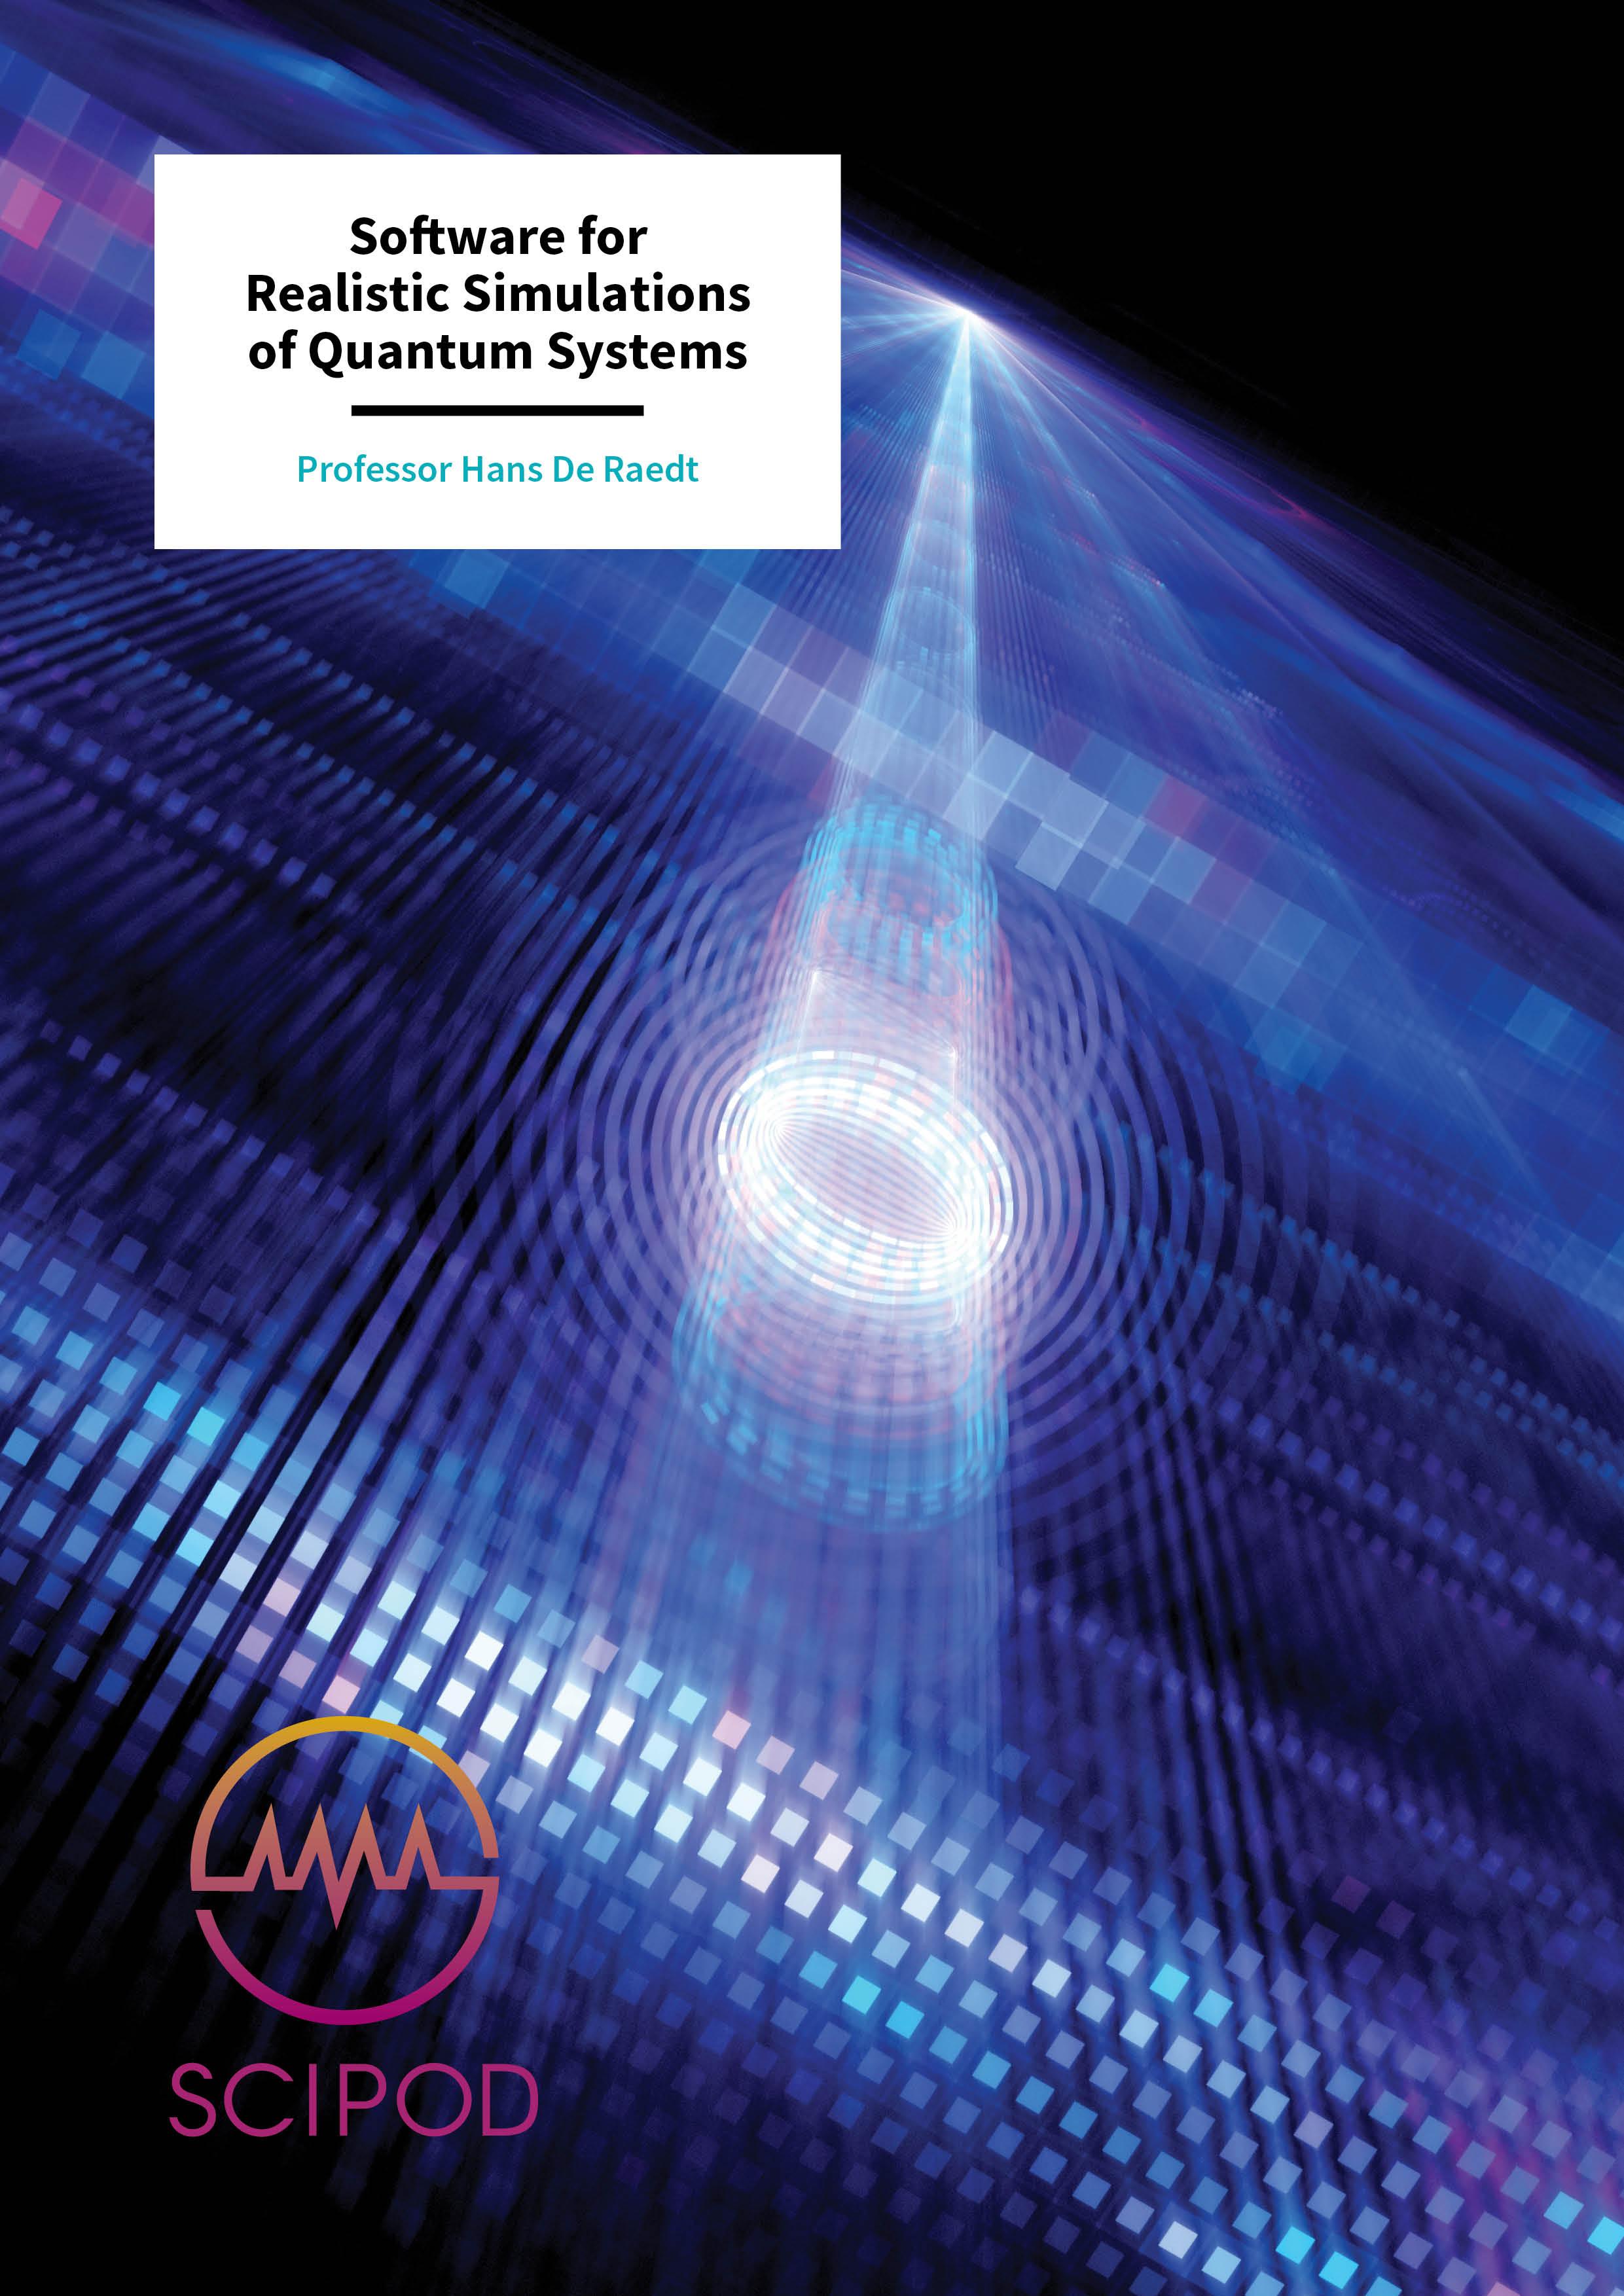 Software for Realistic Simulations of Quantum Systems – Professor Hans De Raedt, University of Groningen